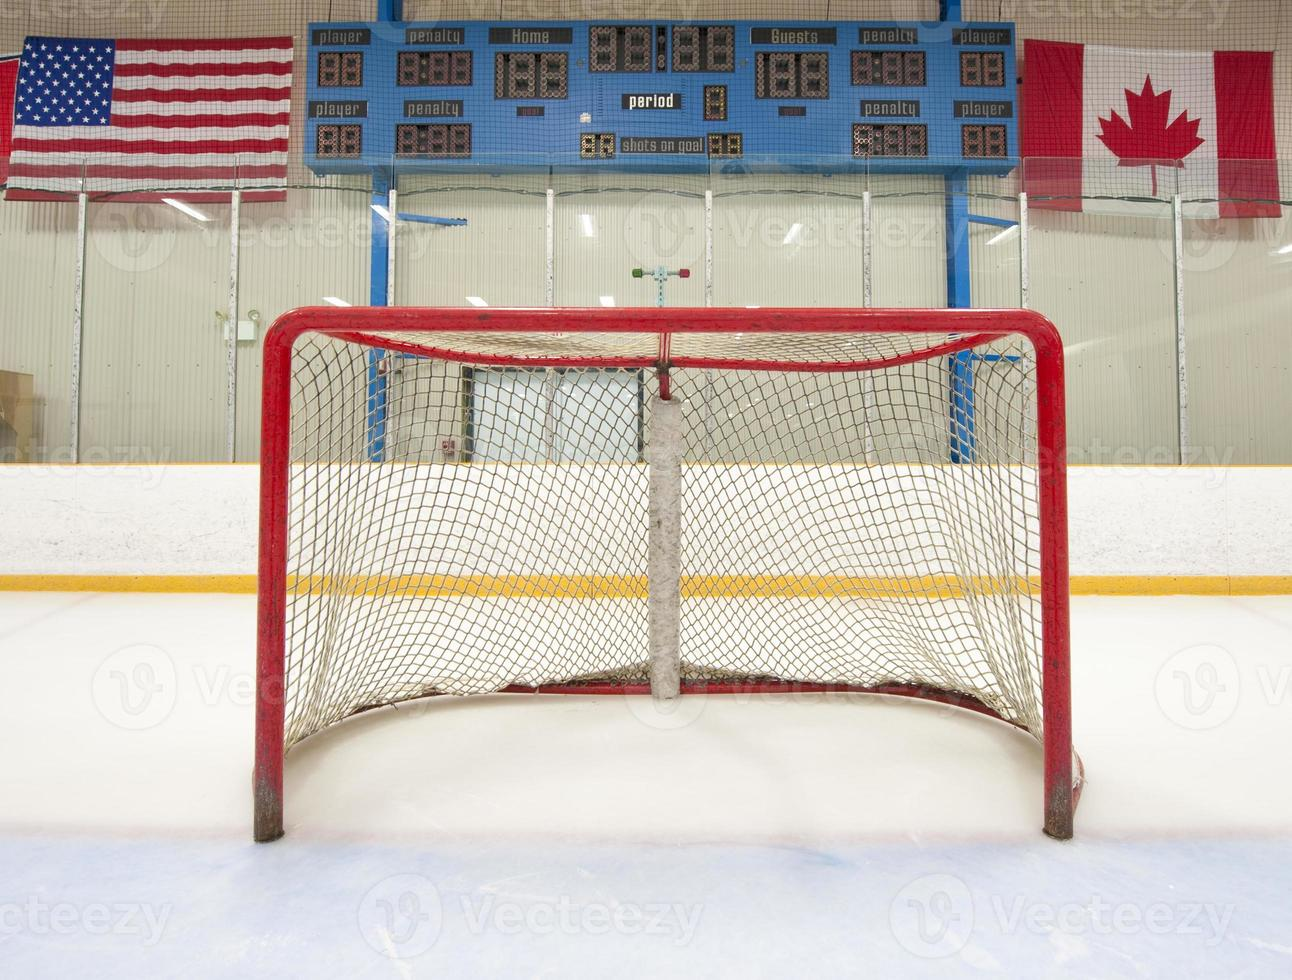 Hockey net with scoreboard photo